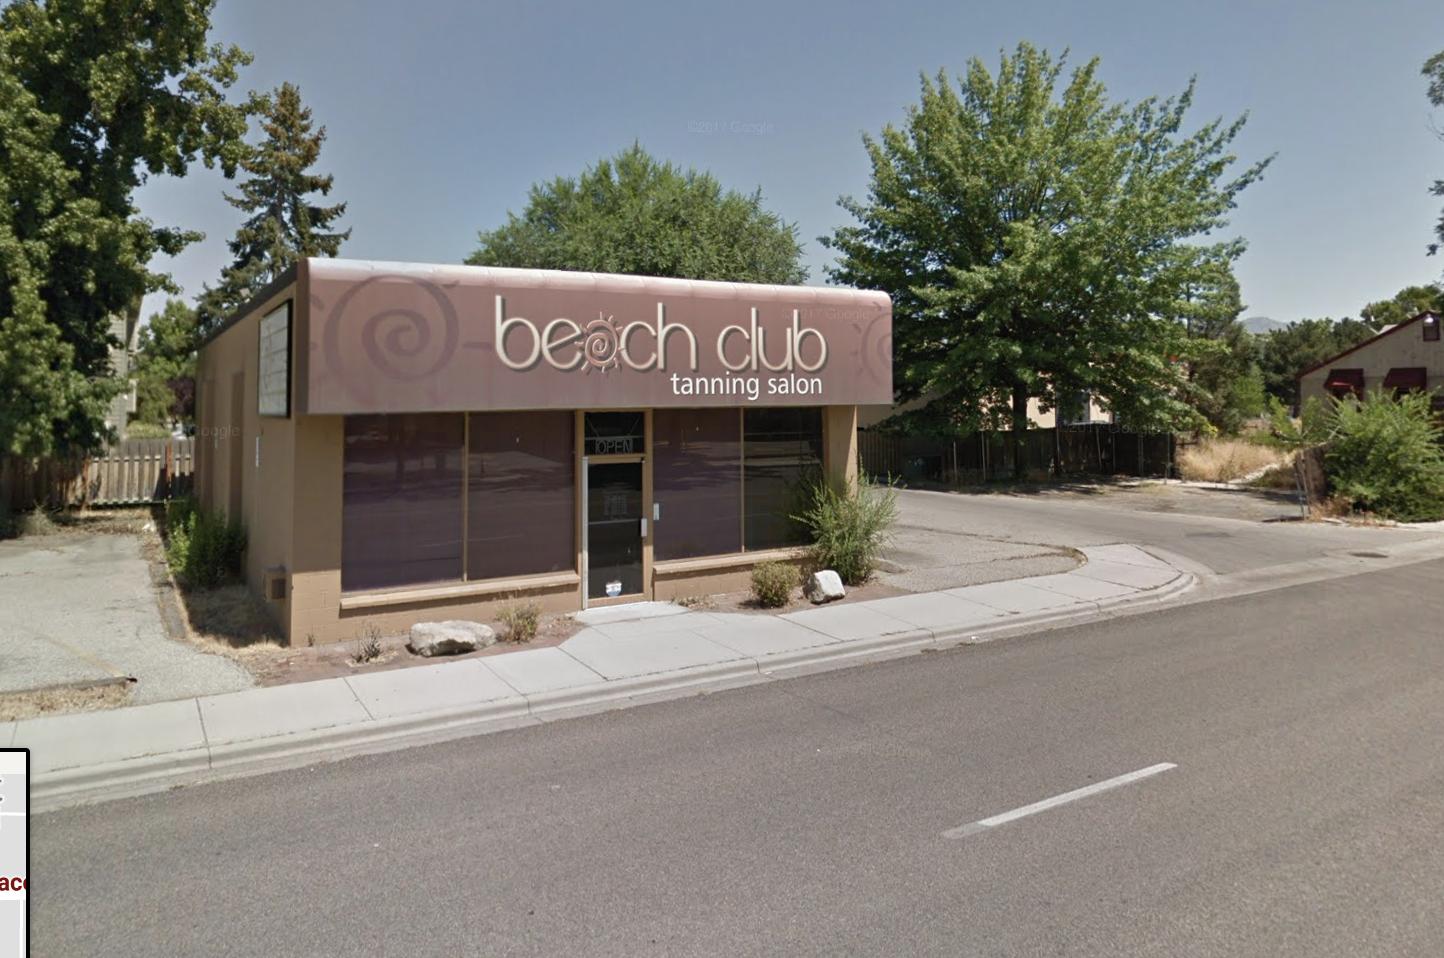 Old Beach Club Tanning via Google Earth